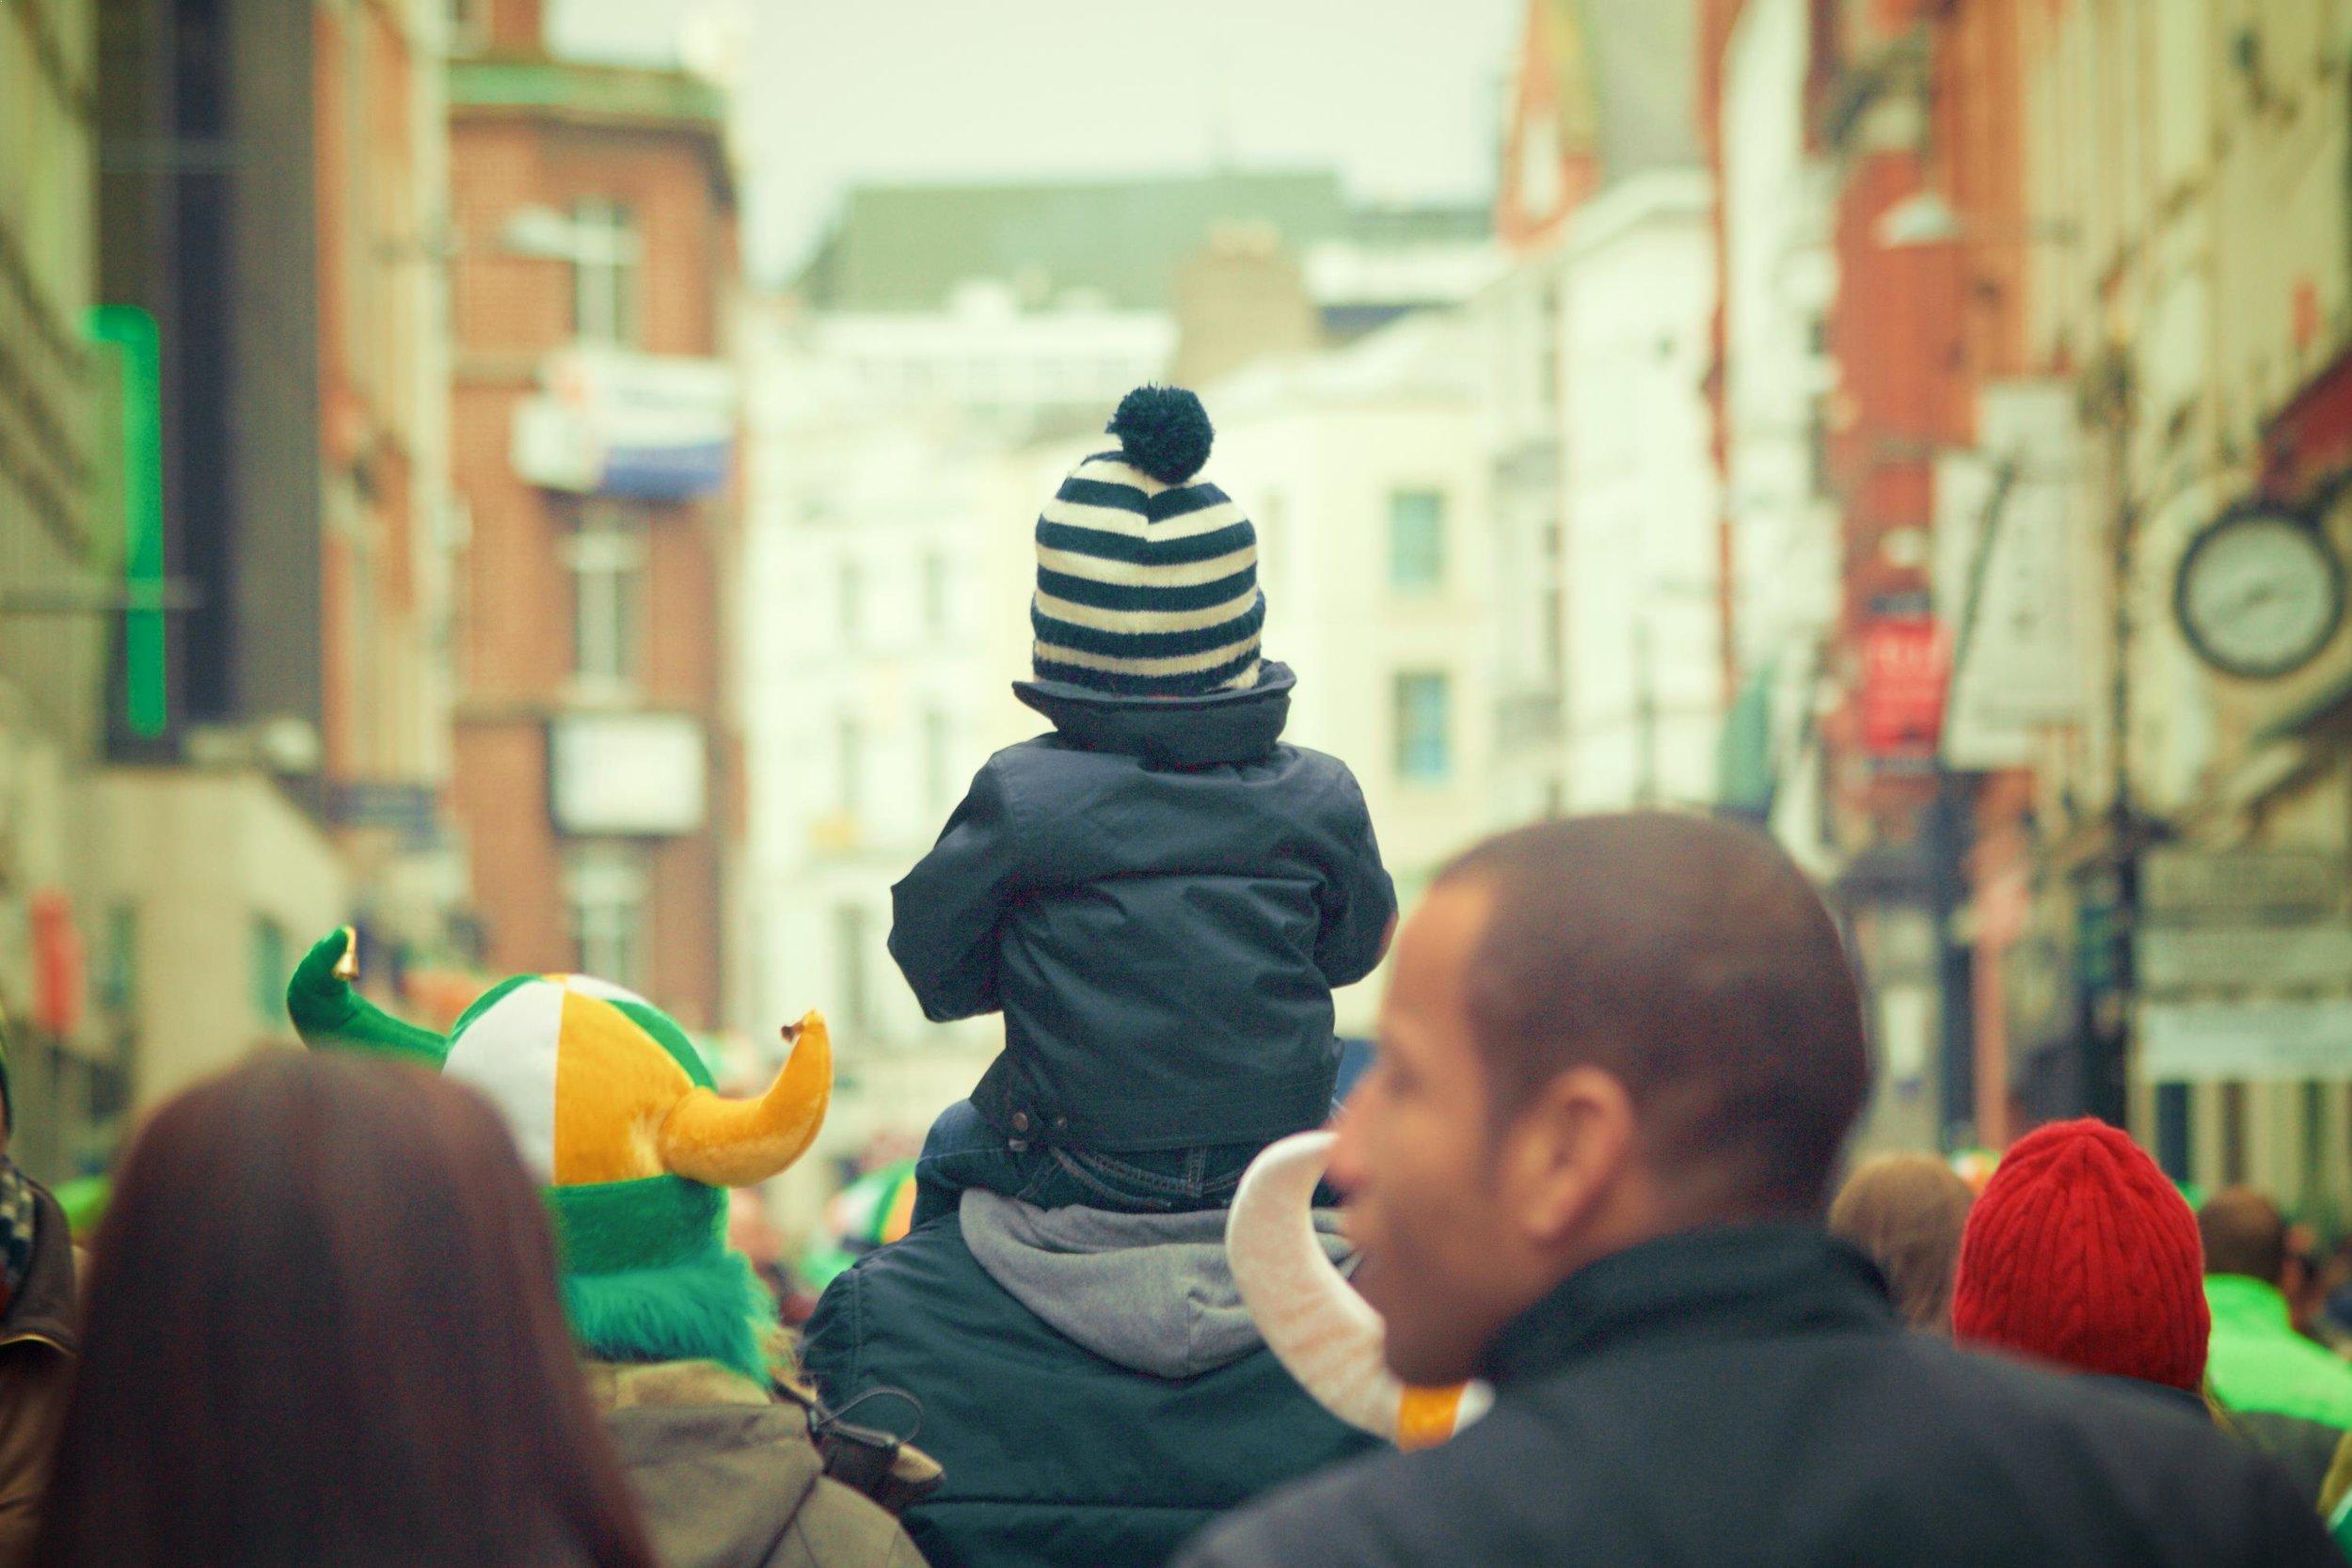 people-crowd-child-kid.jpg